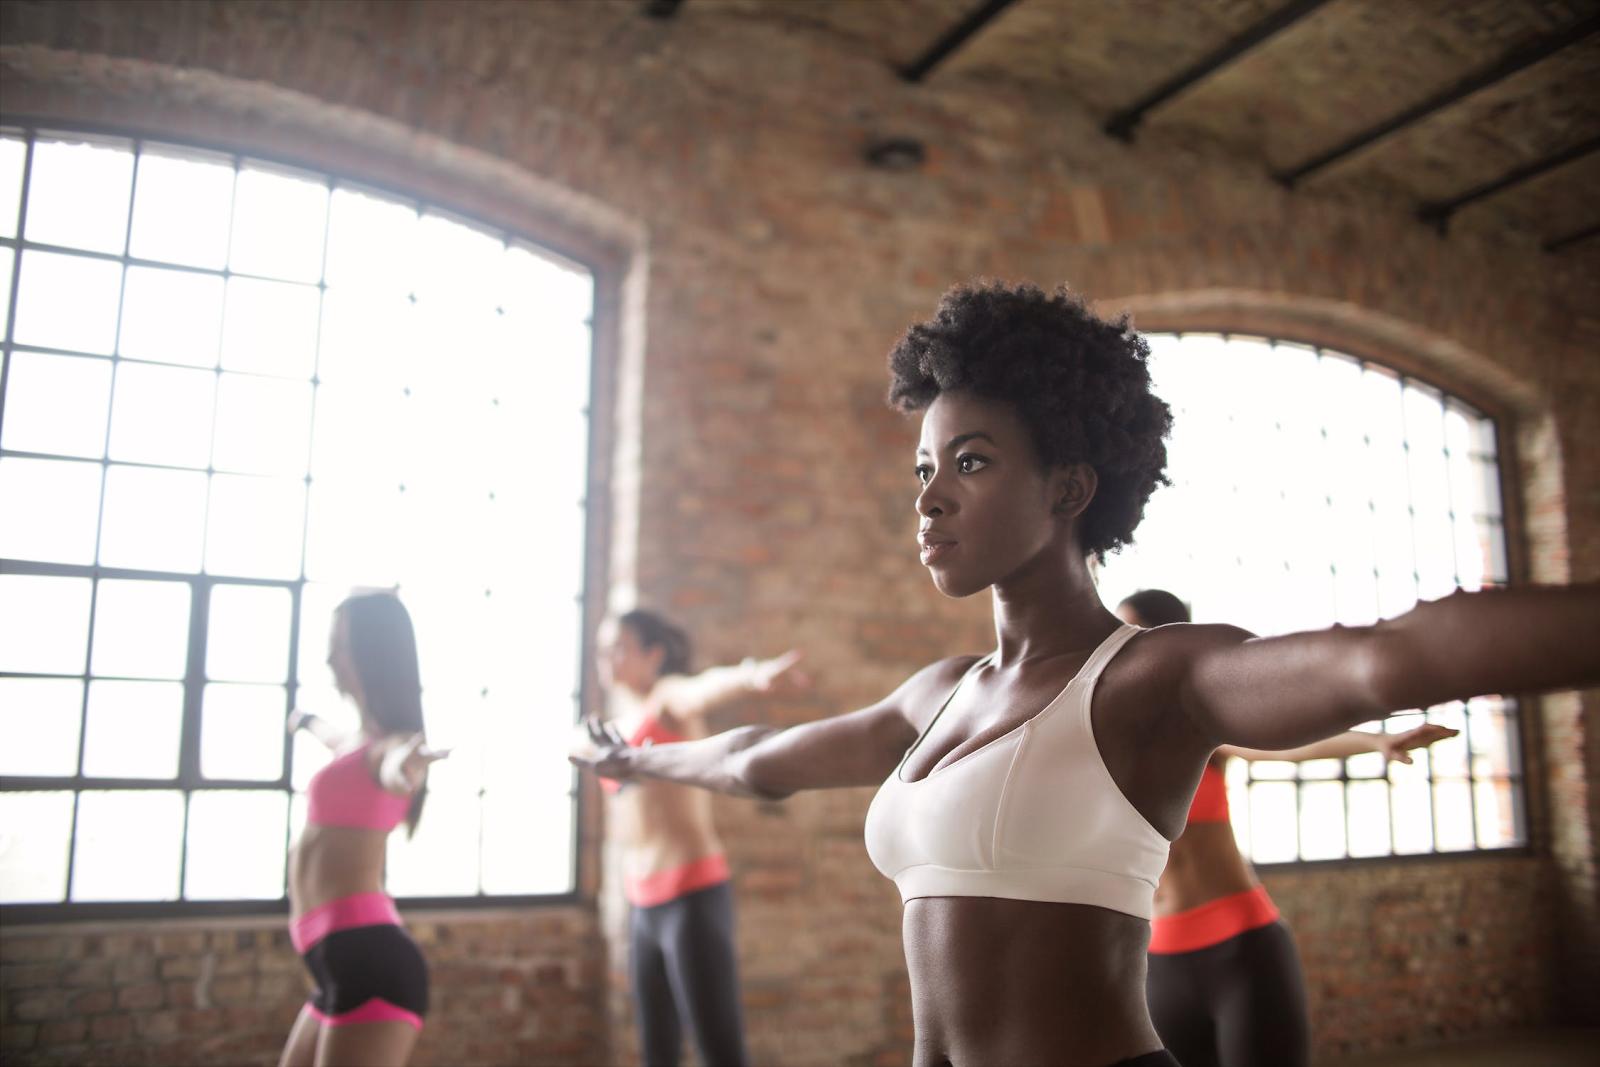 An aerobics class using music to enhance their performance.